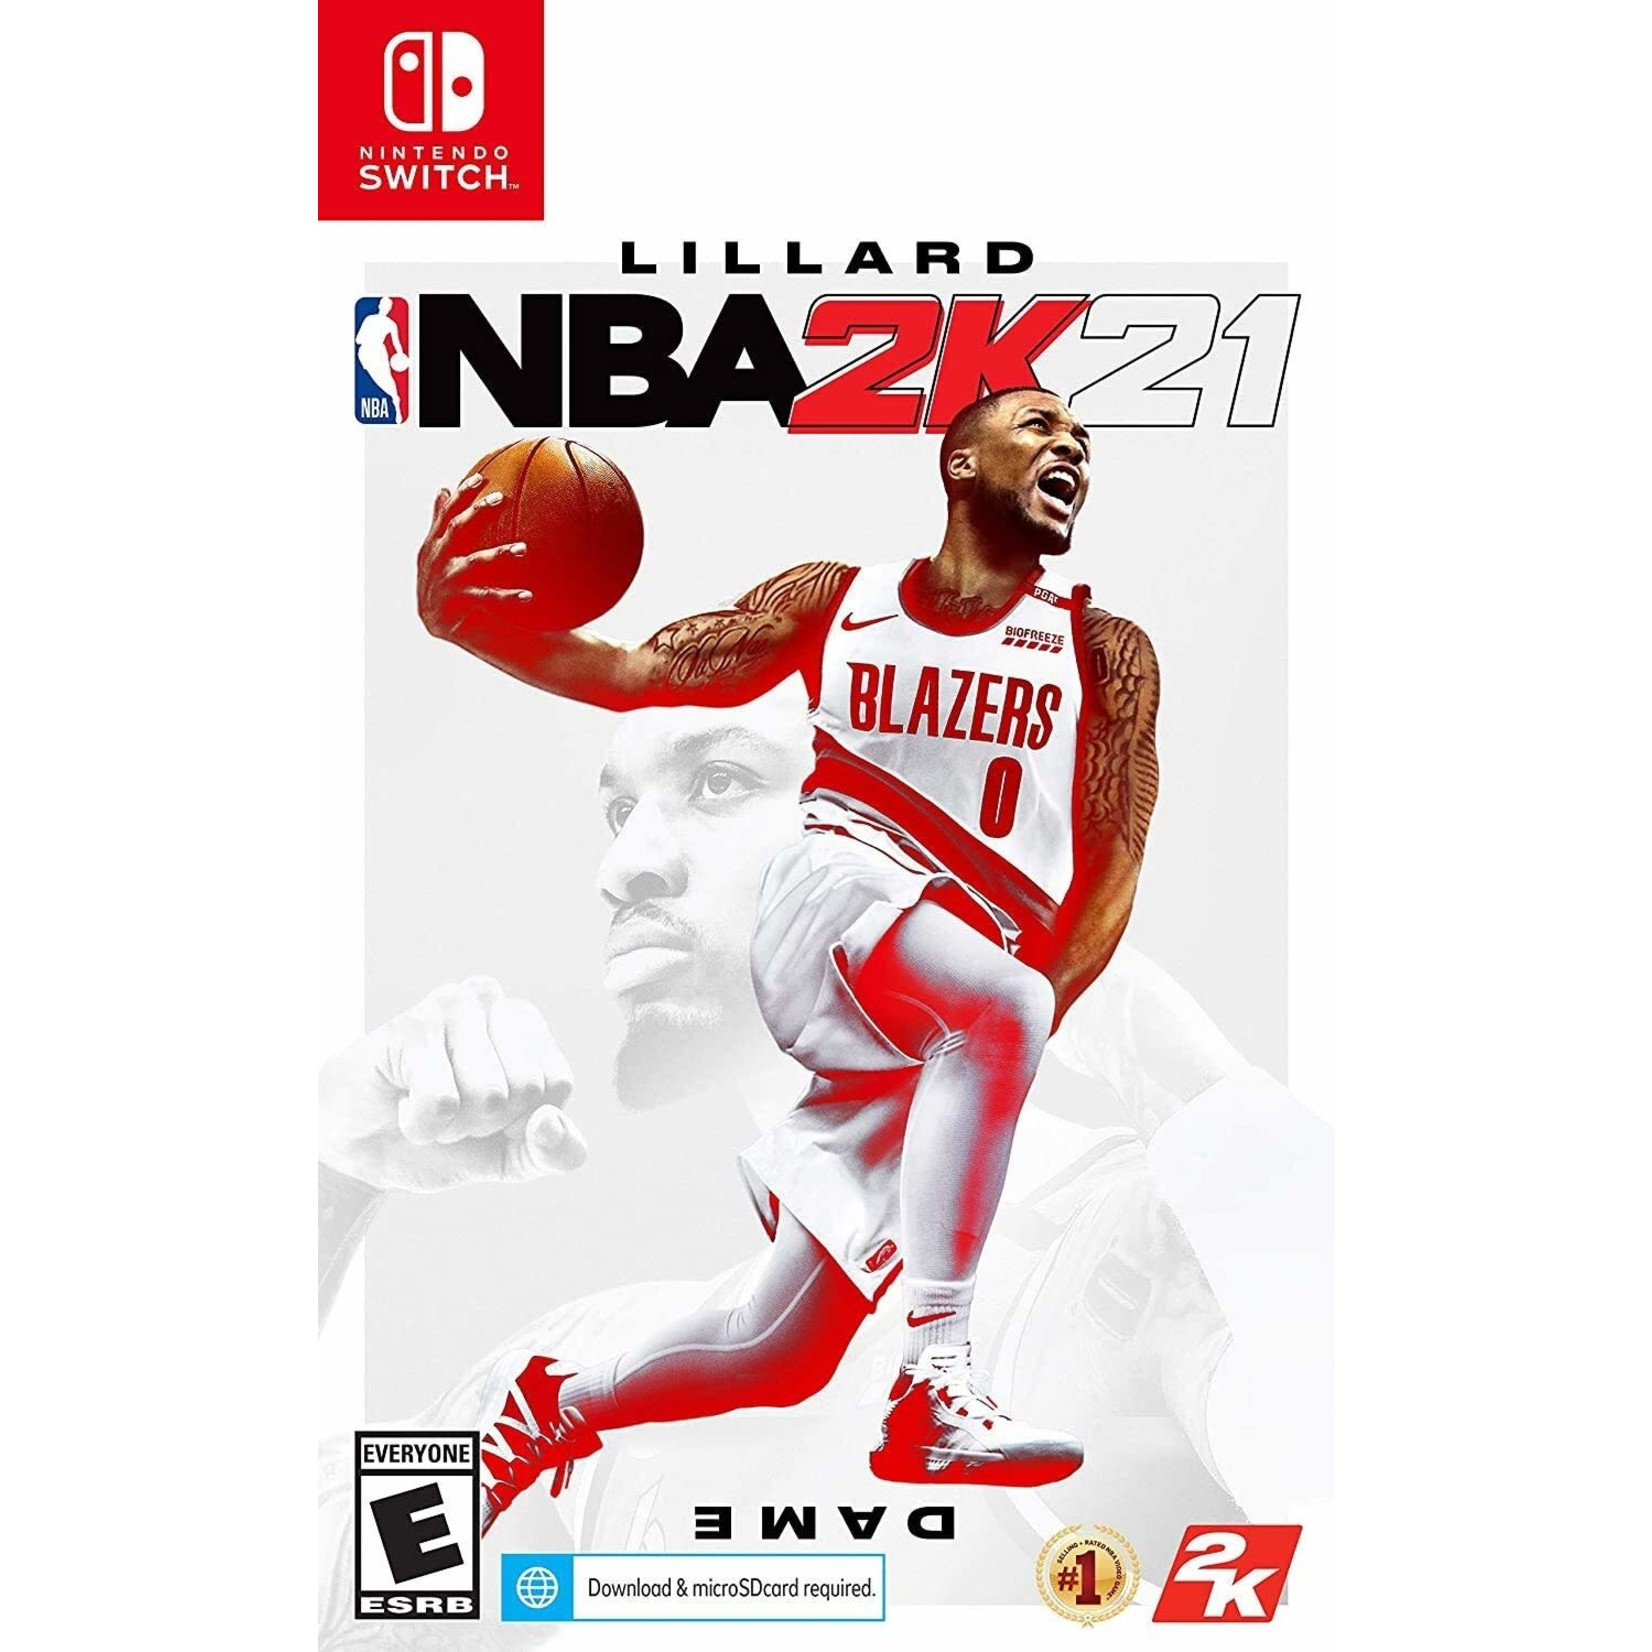 SWITCH-NBA 2K21